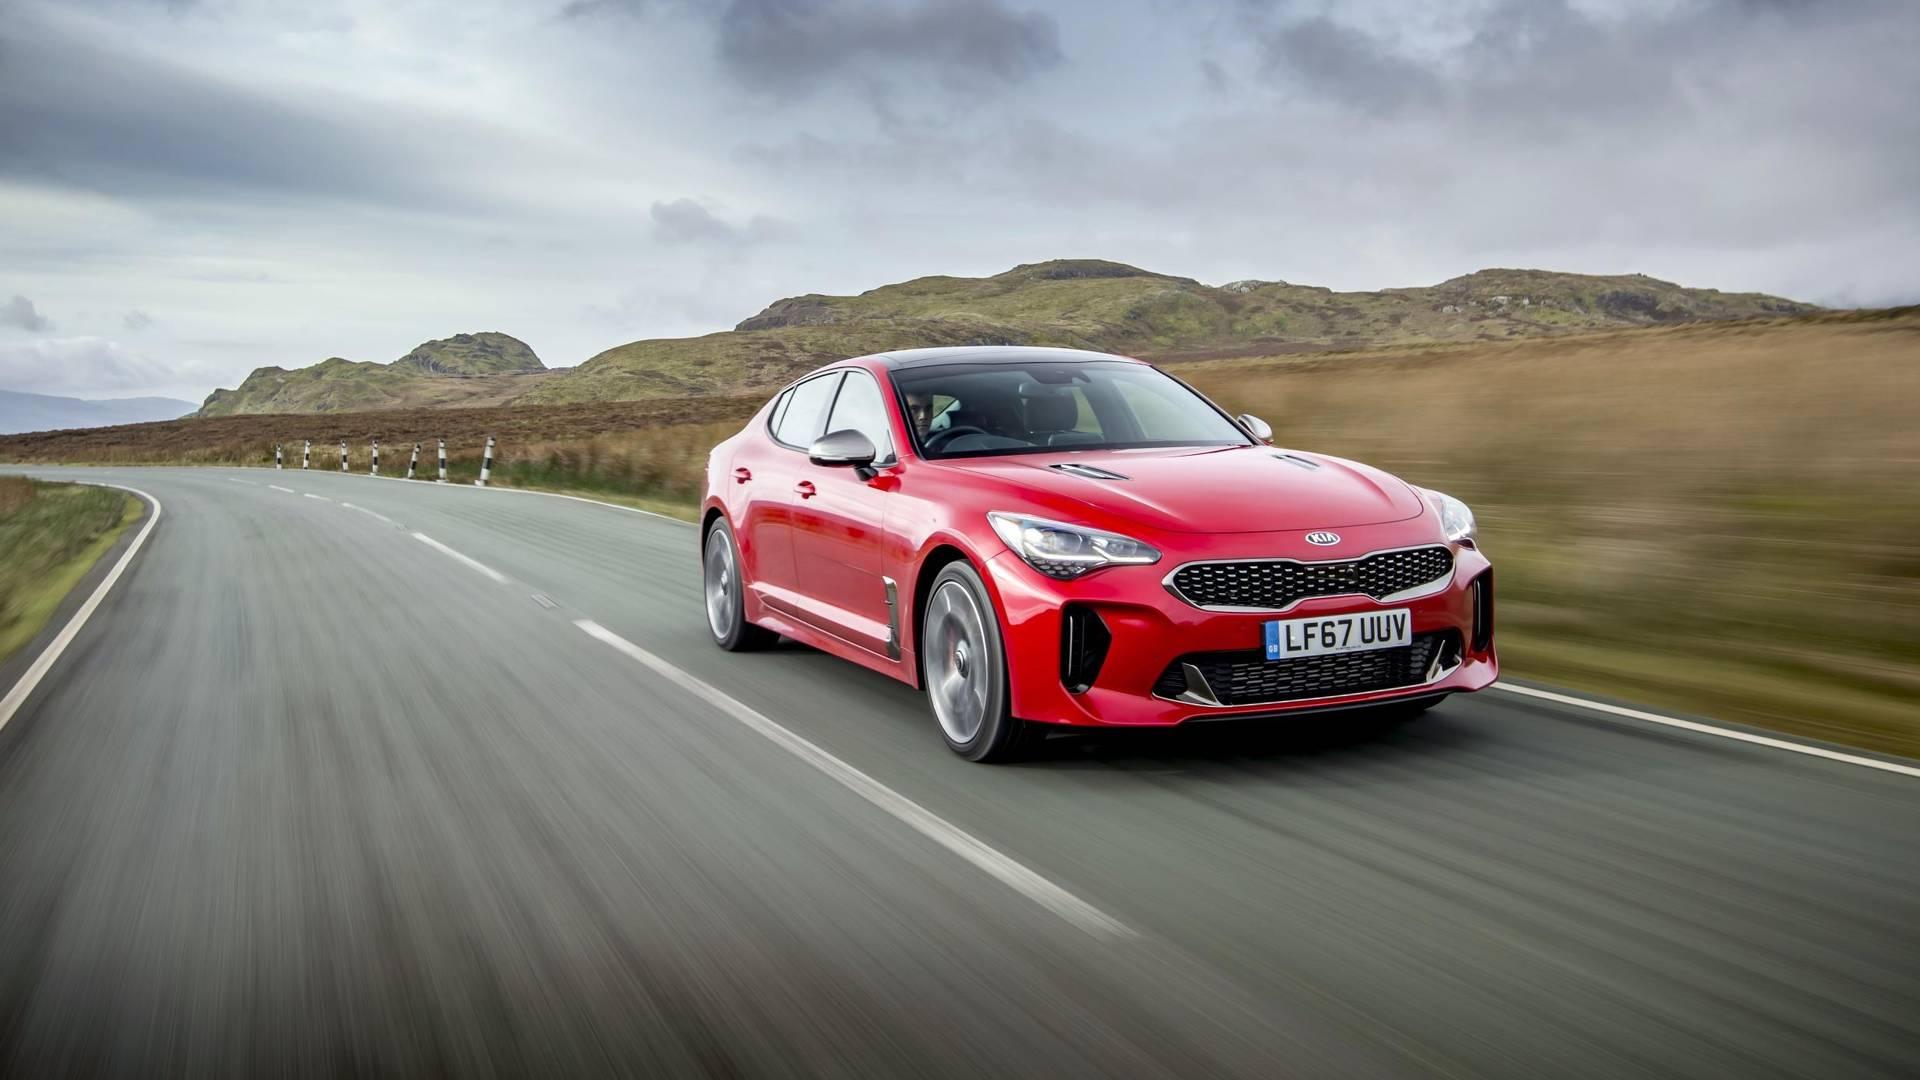 cars car stinger stinge rendering speed kia top coupe sports